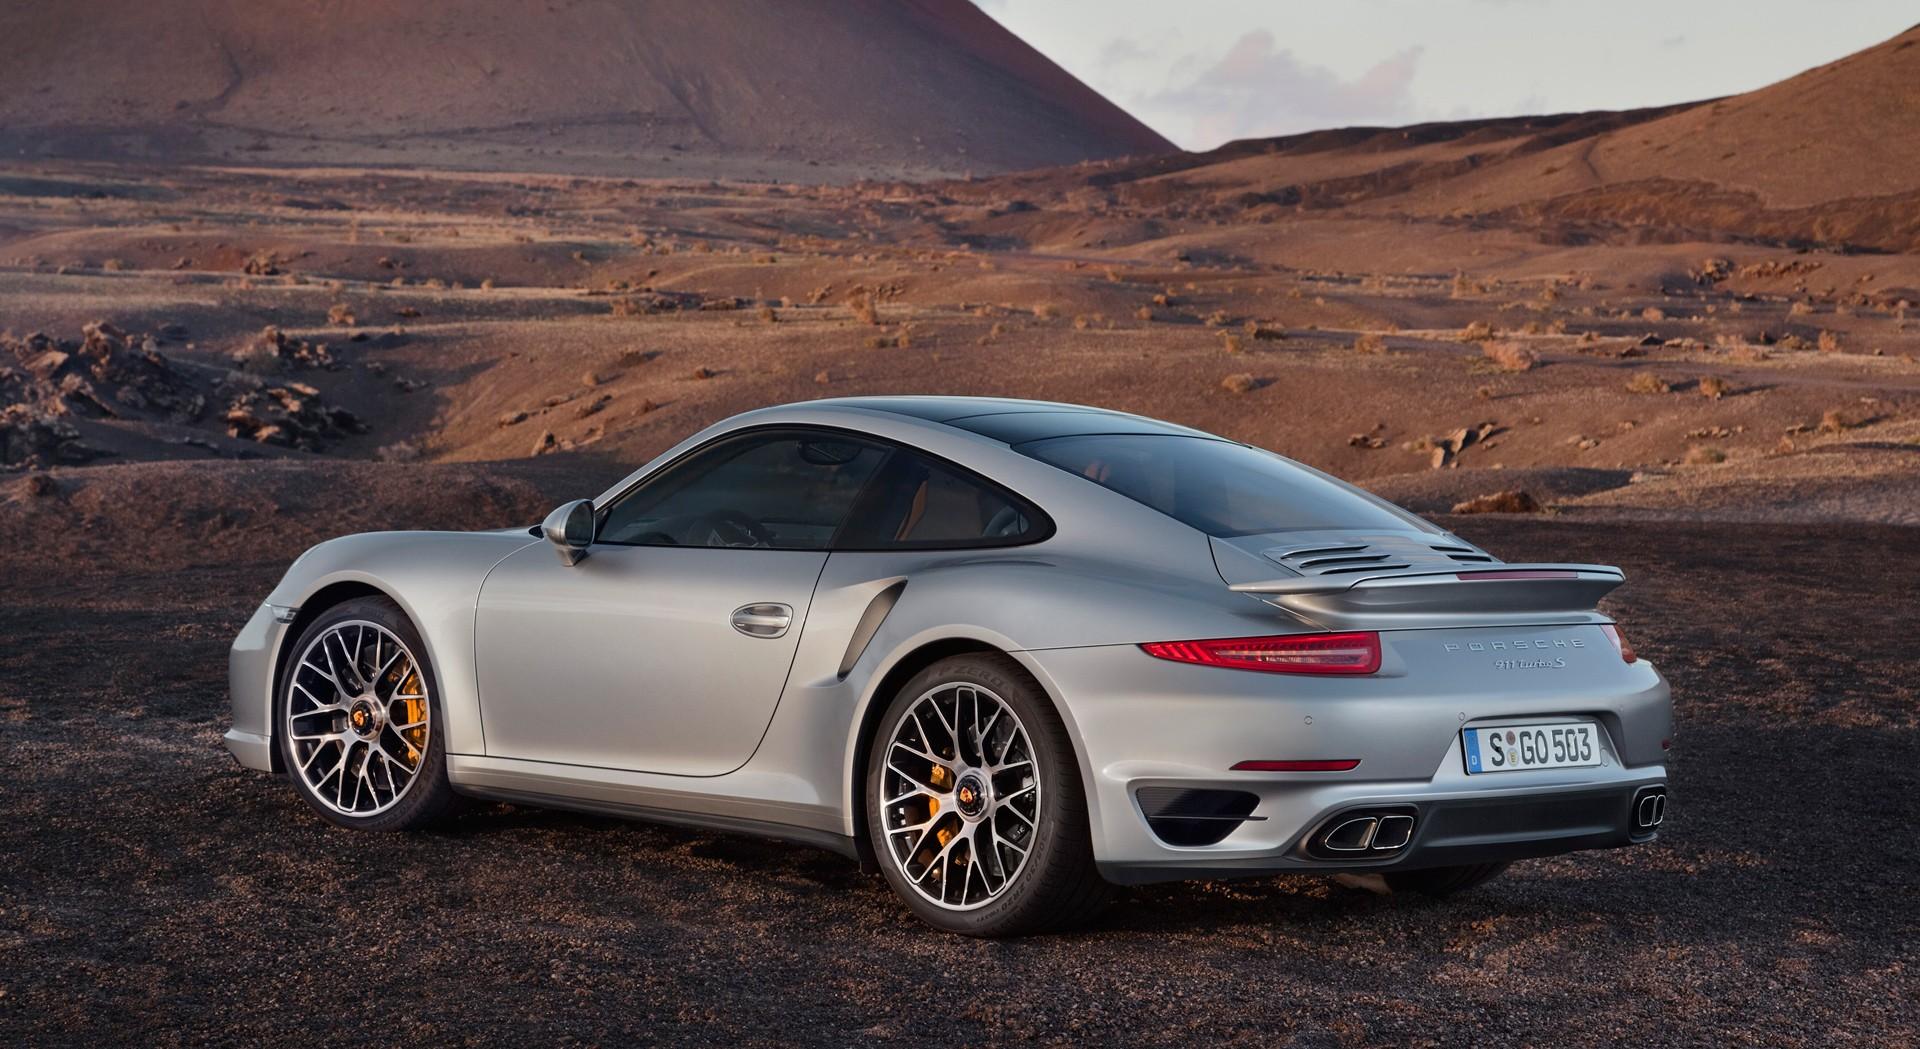 Porsche 911 Wallpapers Archives - HD Desktop Wallpapers